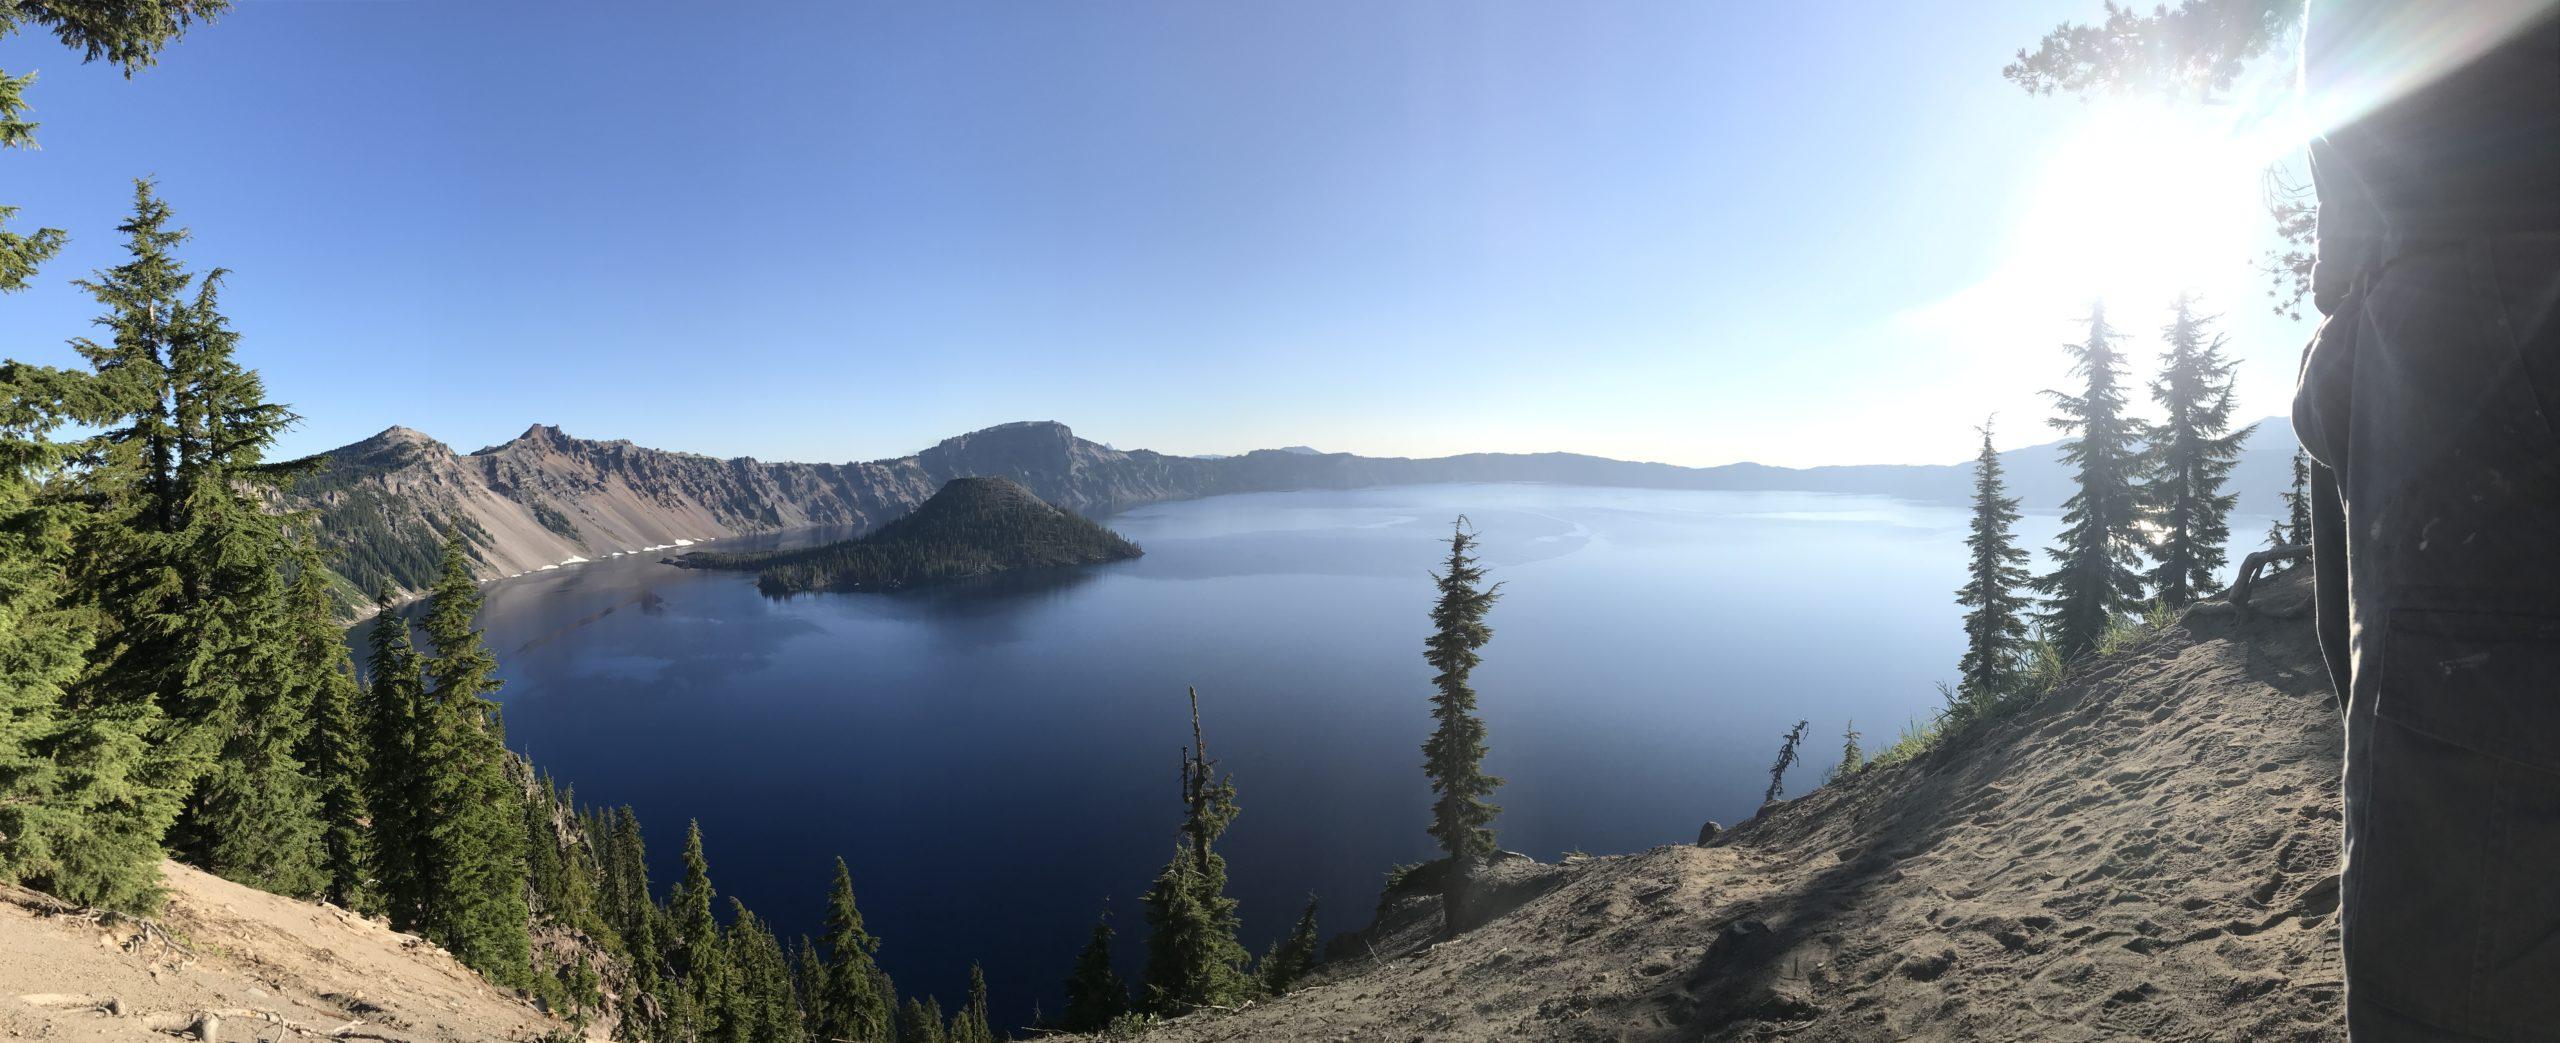 Crater Lake 0719 | The Loaded Brush Paint & Sip Classes | loadedbrushpdx.com